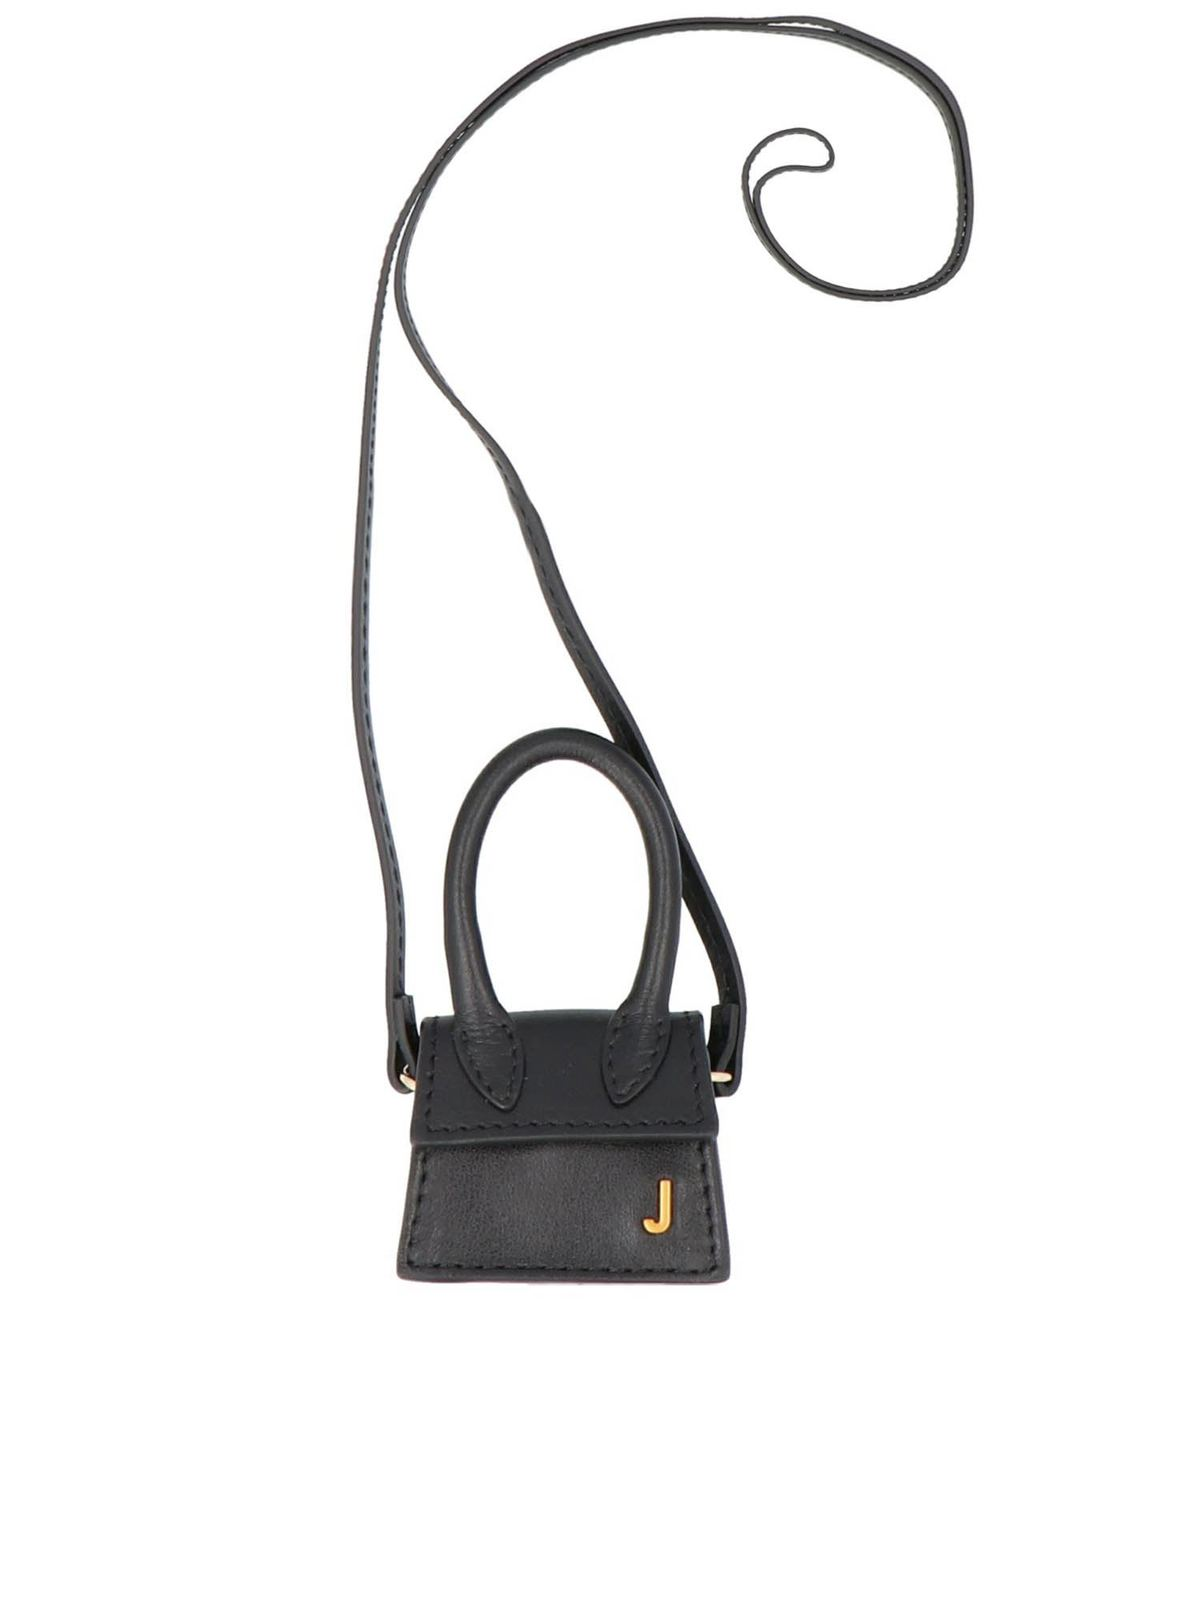 Jacquemus Leathers MICRO LE PETIT CHIQUITO BAG IN BLACK